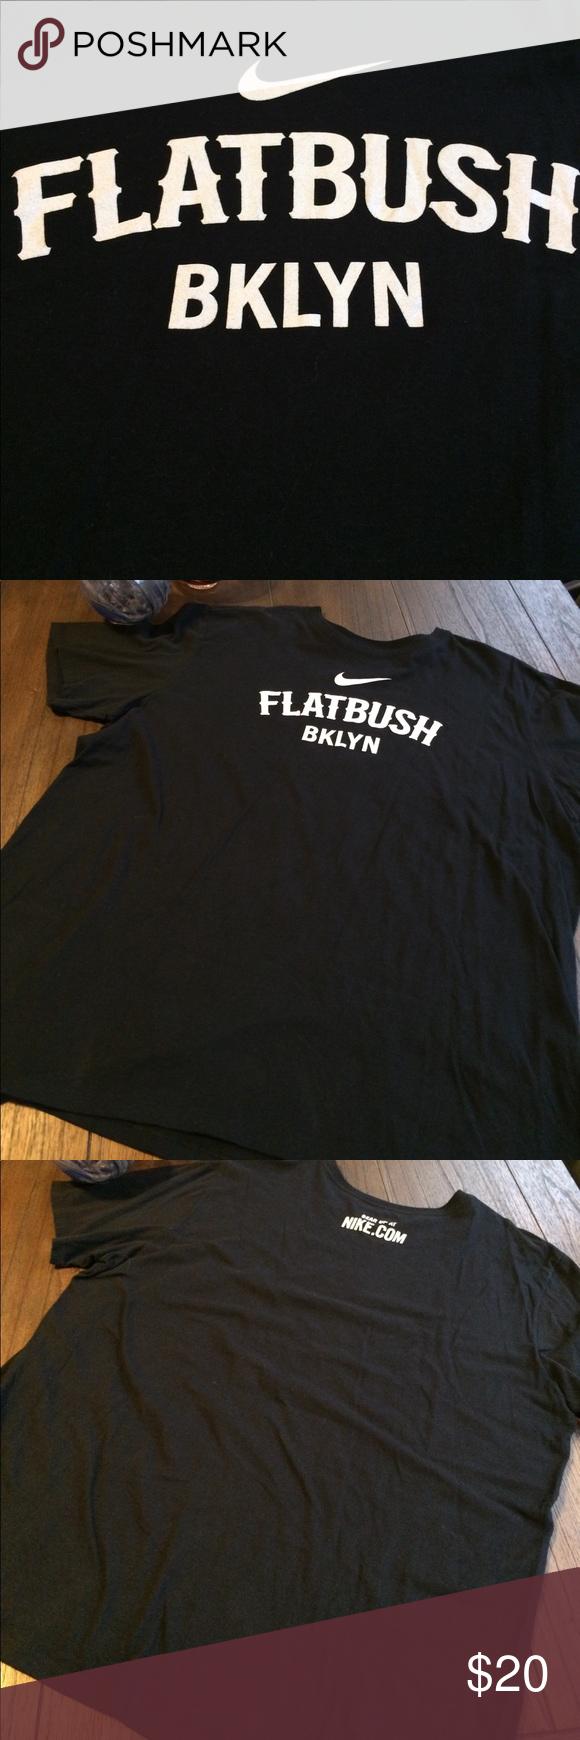 2ee534783 Nike Limited Edition 'Flatbush, Bklyn' Tee EUC Nike limited edition ' Flatbush, Bklyn' Tee. Black with white lettering. Nike Shirts Tees - Short  Sleeve